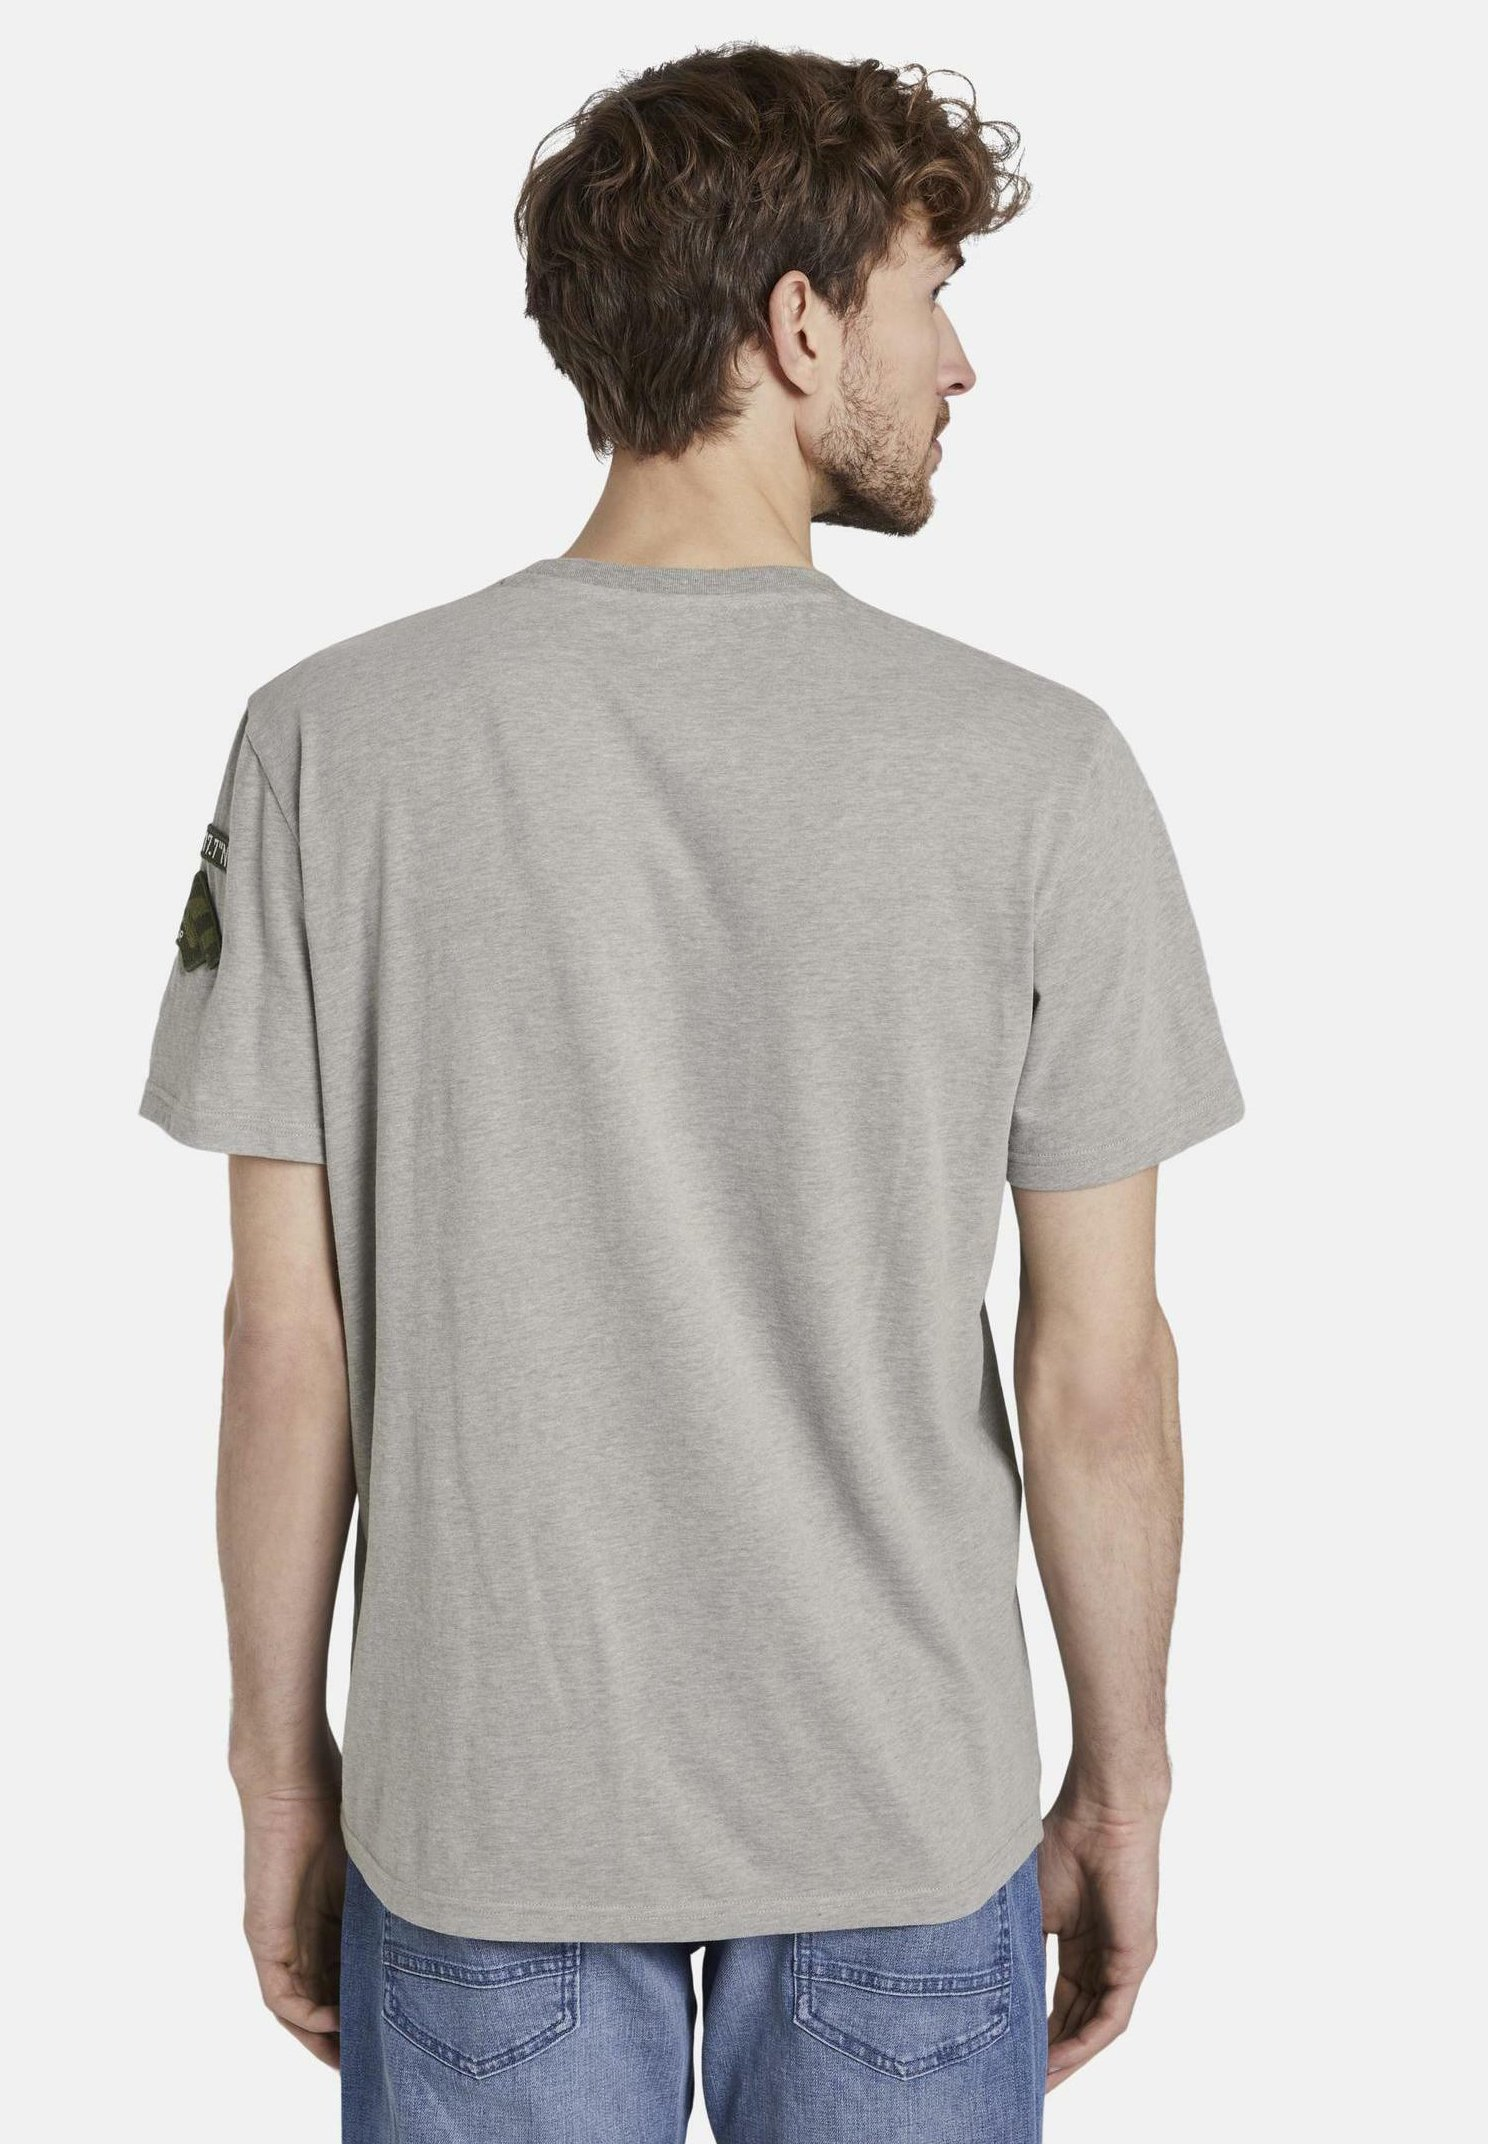 Große Förderung TOM TAILOR TOM TAILOR T-SHIRT T-SHIRT MIT BADGE-DETAILS - T-Shirt print - light stone grey melange | Damenbekleidung 2020